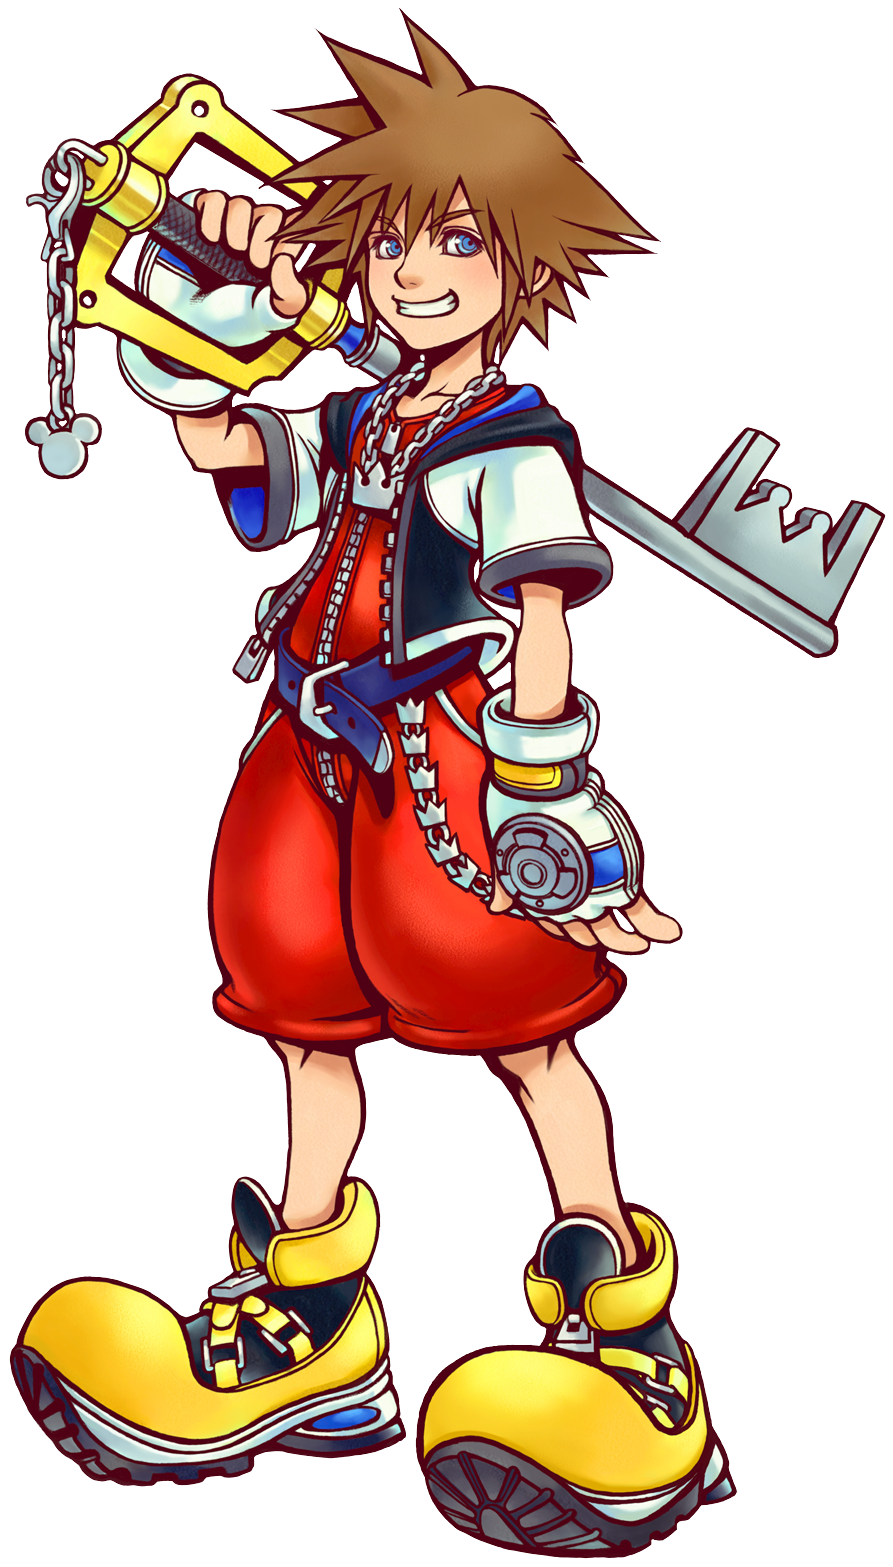 Kingdom hearts sora clipart image free library Roast Sora From Kingdom Hearts [KH1] : KingdomHearts image free library